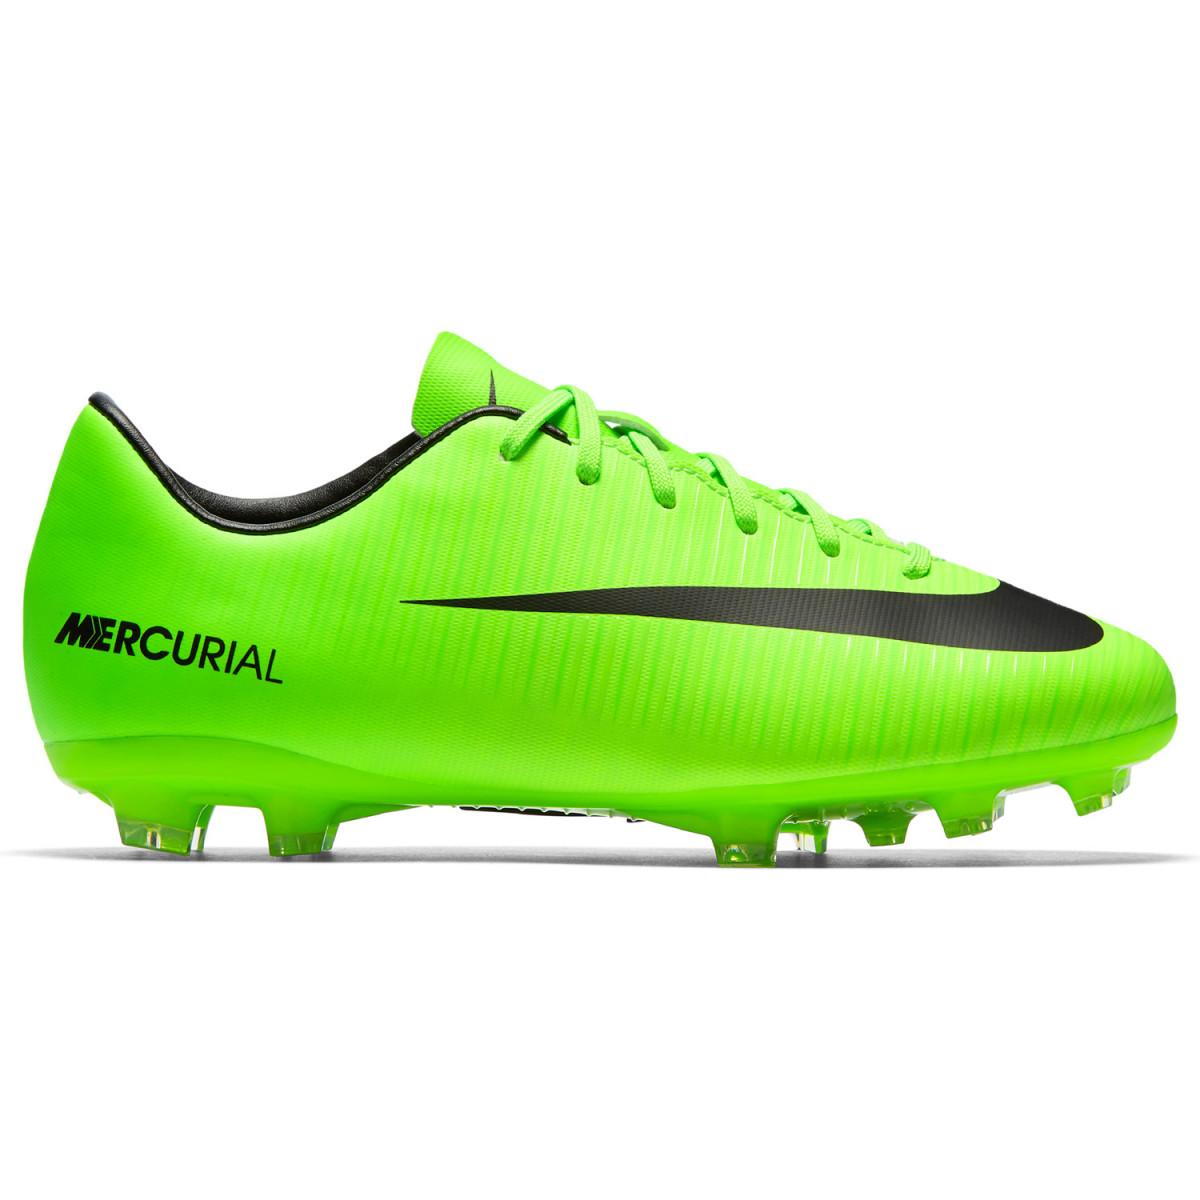 52a4cbb8f Botines Nike Mercurial Vapor VI Fg Jr - Césped - Botines - Niños